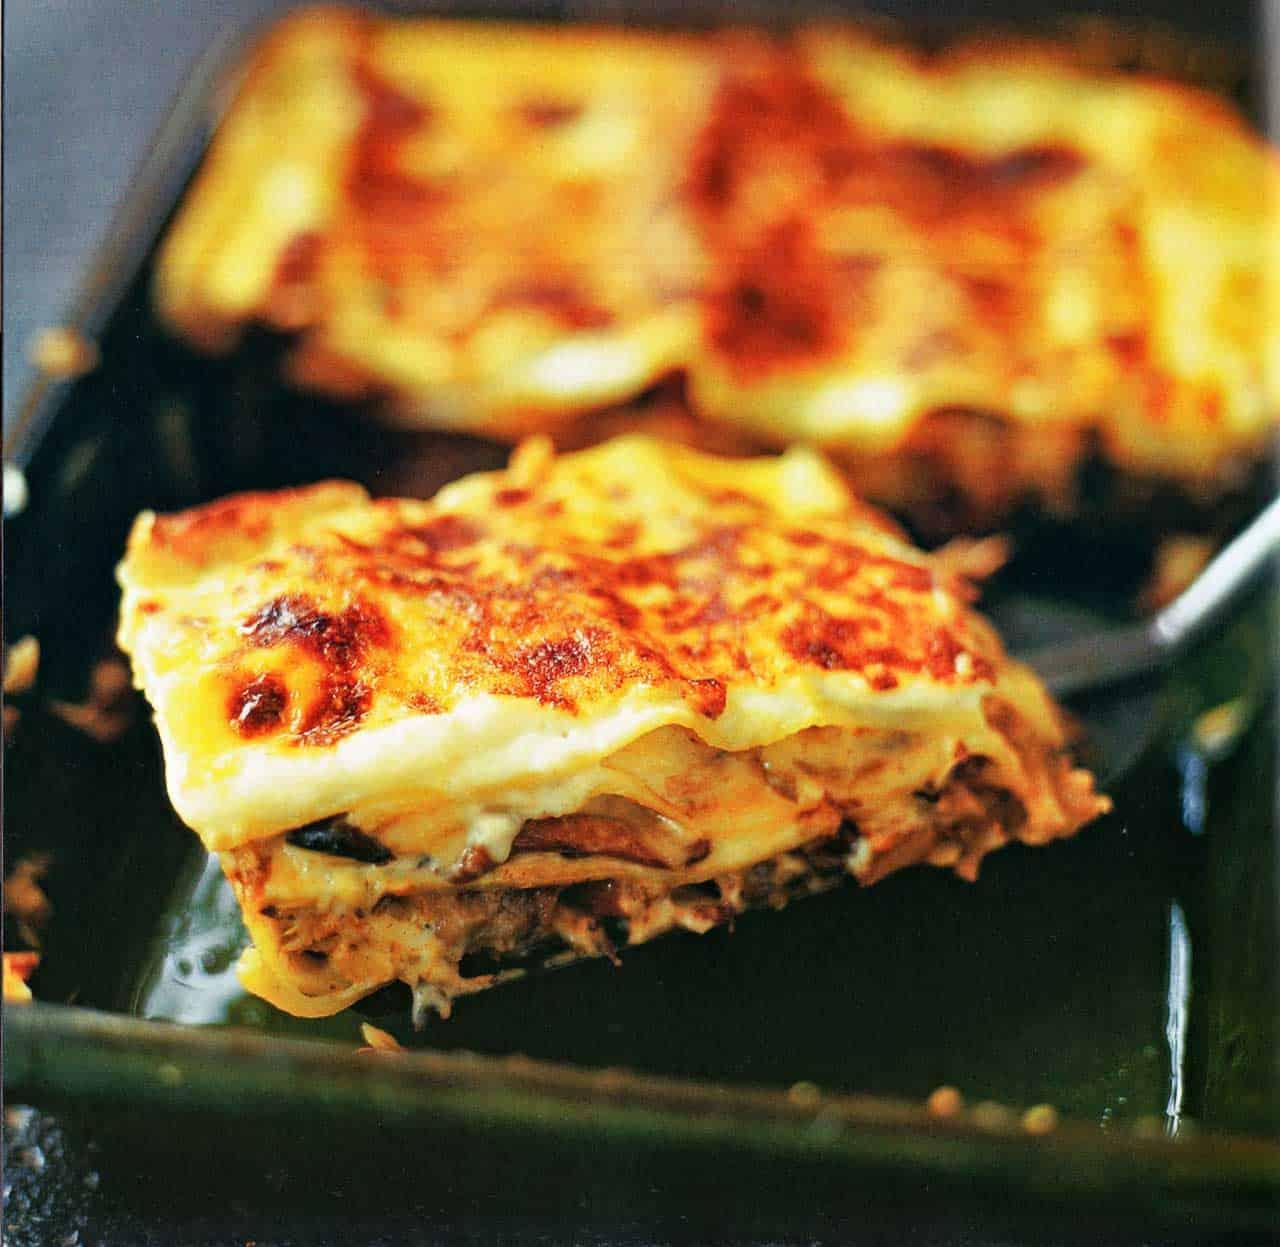 vegetarian lasagne recipe-pasta per lasagne recipe www.eatopic.com